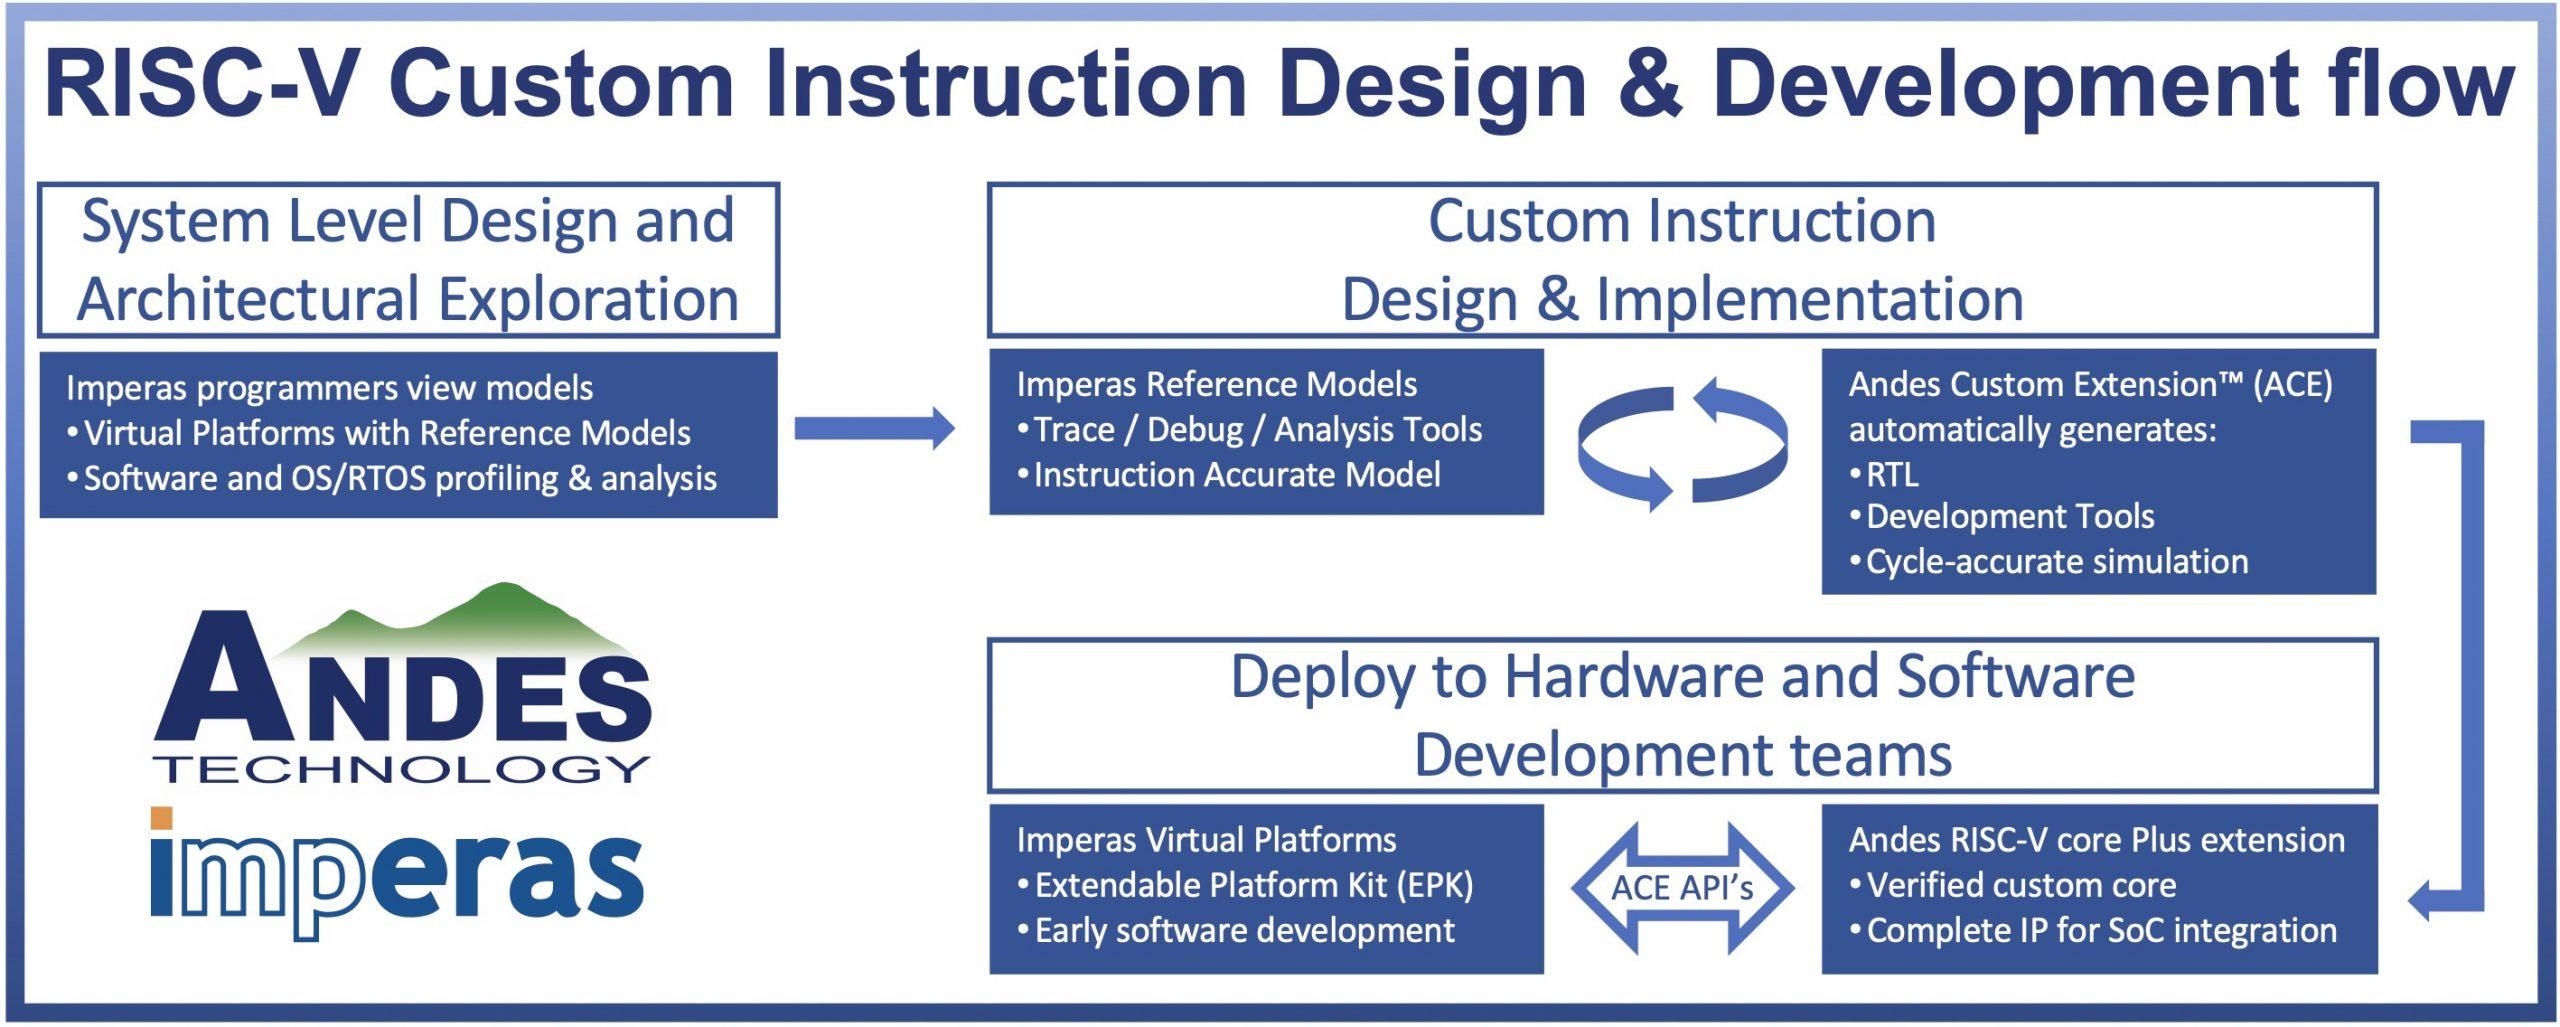 Webinar: RISC-V Custom Instructions – Design, Development and Deployment, Feb 24 2021 | Imperas